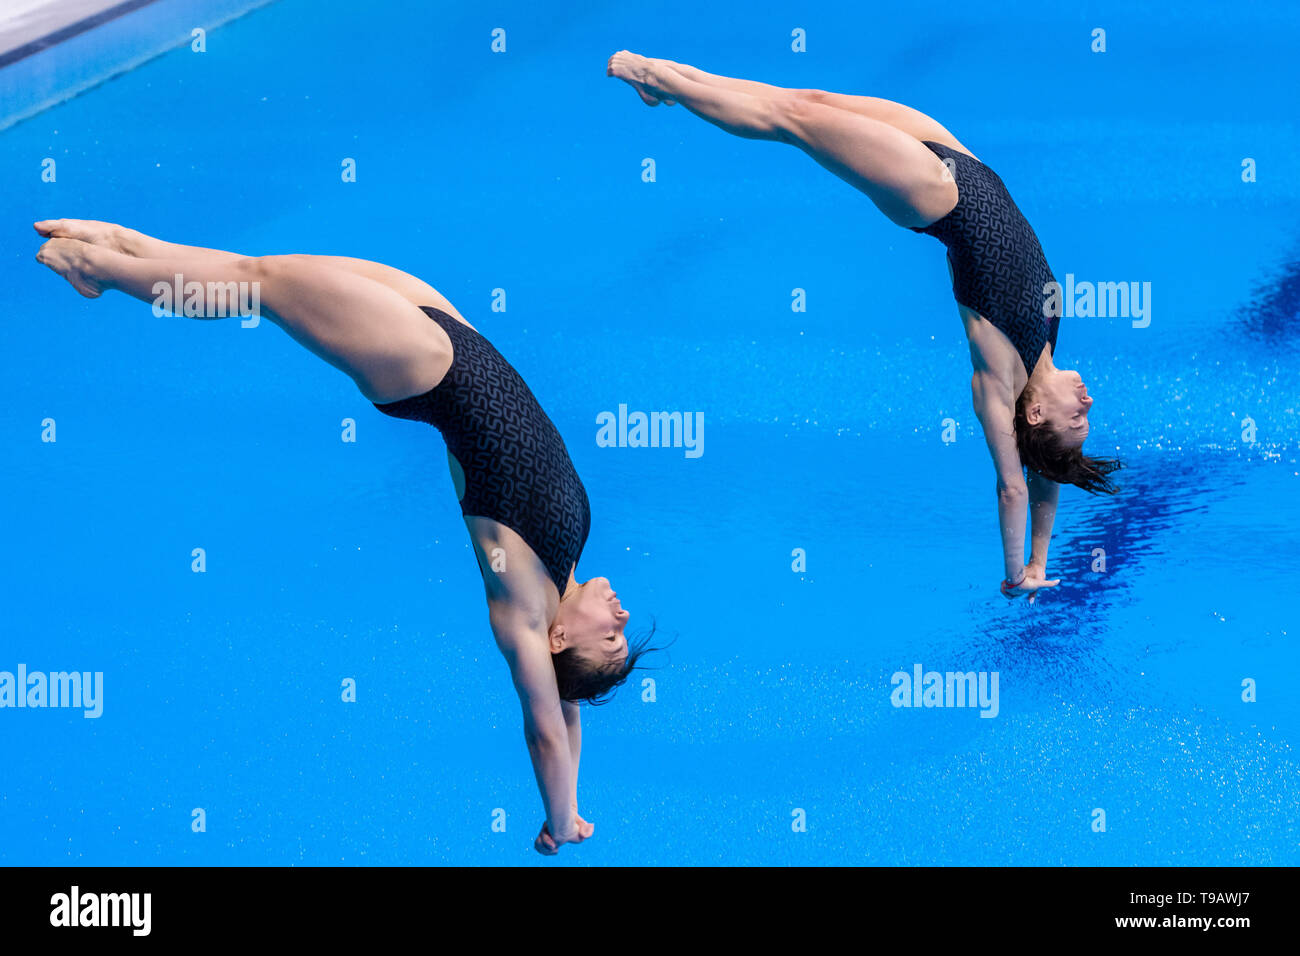 London, UK. 17th May, 2019. Viktoriya Kesar and Anna Pysmenska (UKR) compete in Women's 3m Synchro Springboard Final during FINA/CNSG Diving World Series Final at London Aquatics Centre on Friday, 17 May 2019. London England.  Credit: Taka G Wu/Alamy Live News - Stock Image